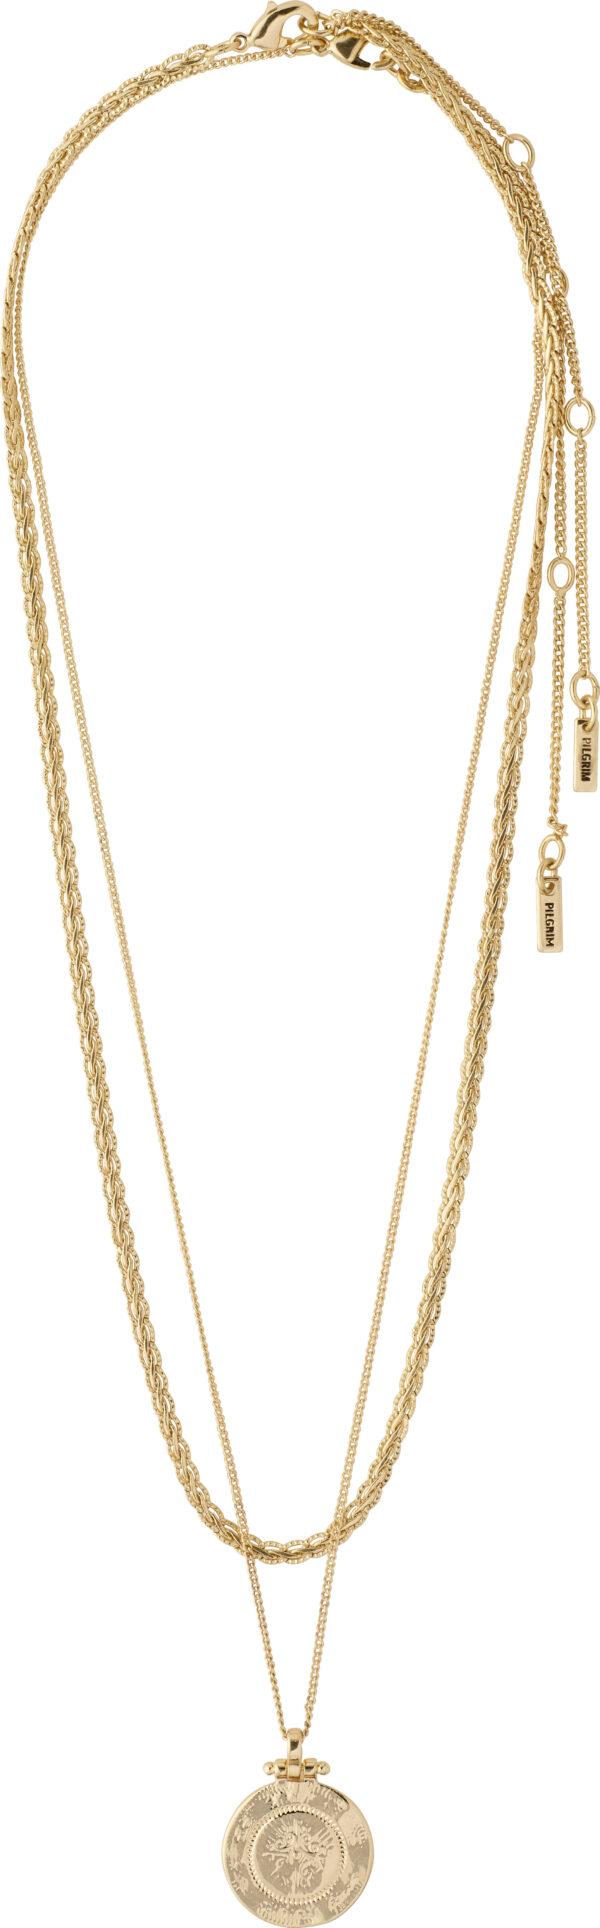 132122011 necklace nomad goldplated karma pilgrim 2